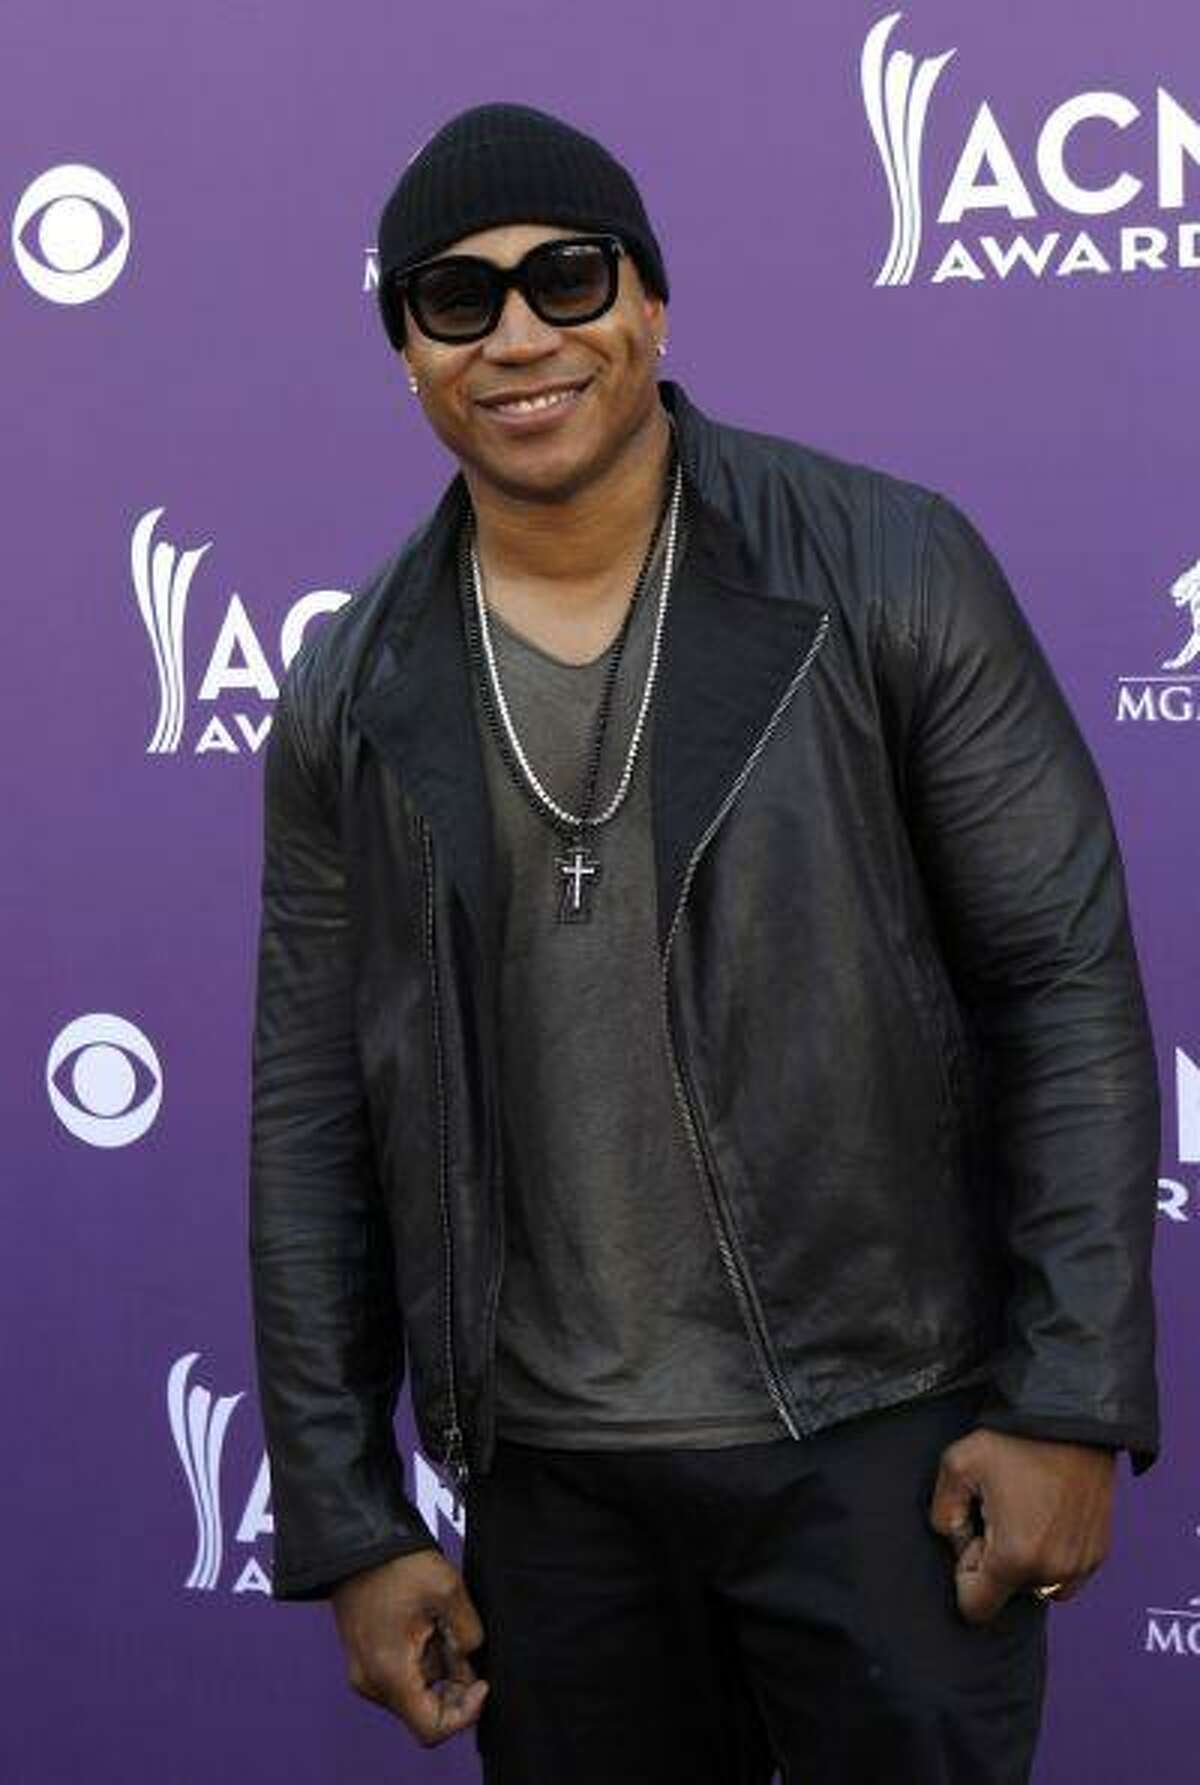 Hip Hop artist LL Cool J arrives at the 48th ACM Awards in Las Vegas, April 7, 2013. REUTERS/Steve Marcus (UNITED STATES - Tags: ENTERTAINMENT) (ACM-ARRIVALS)